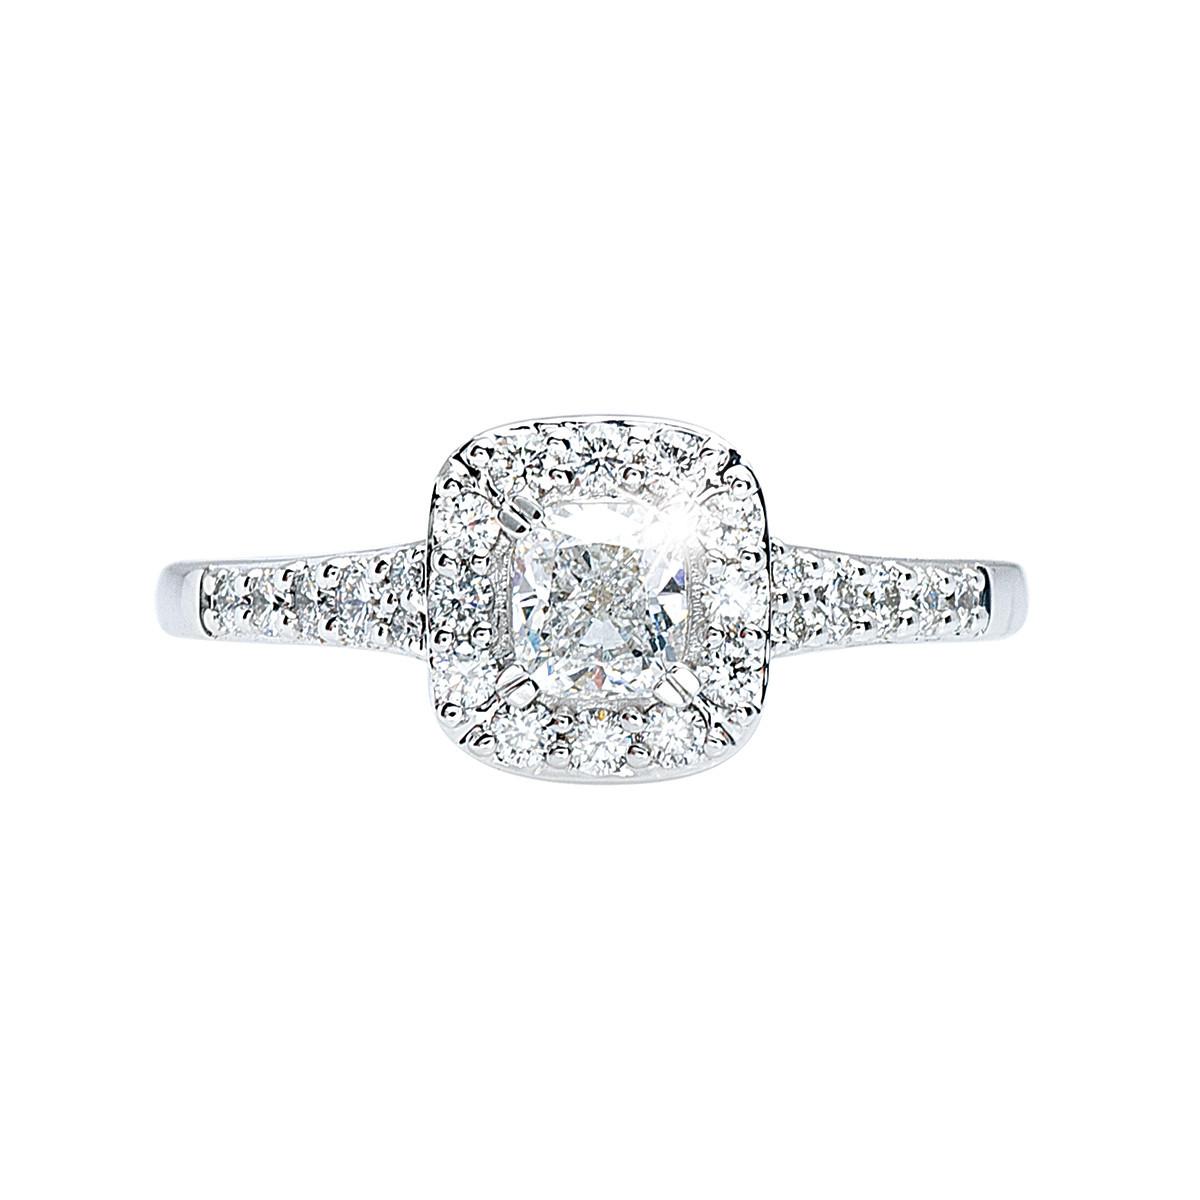 New 0.85 CTW Diamond Halo Engagement Ring